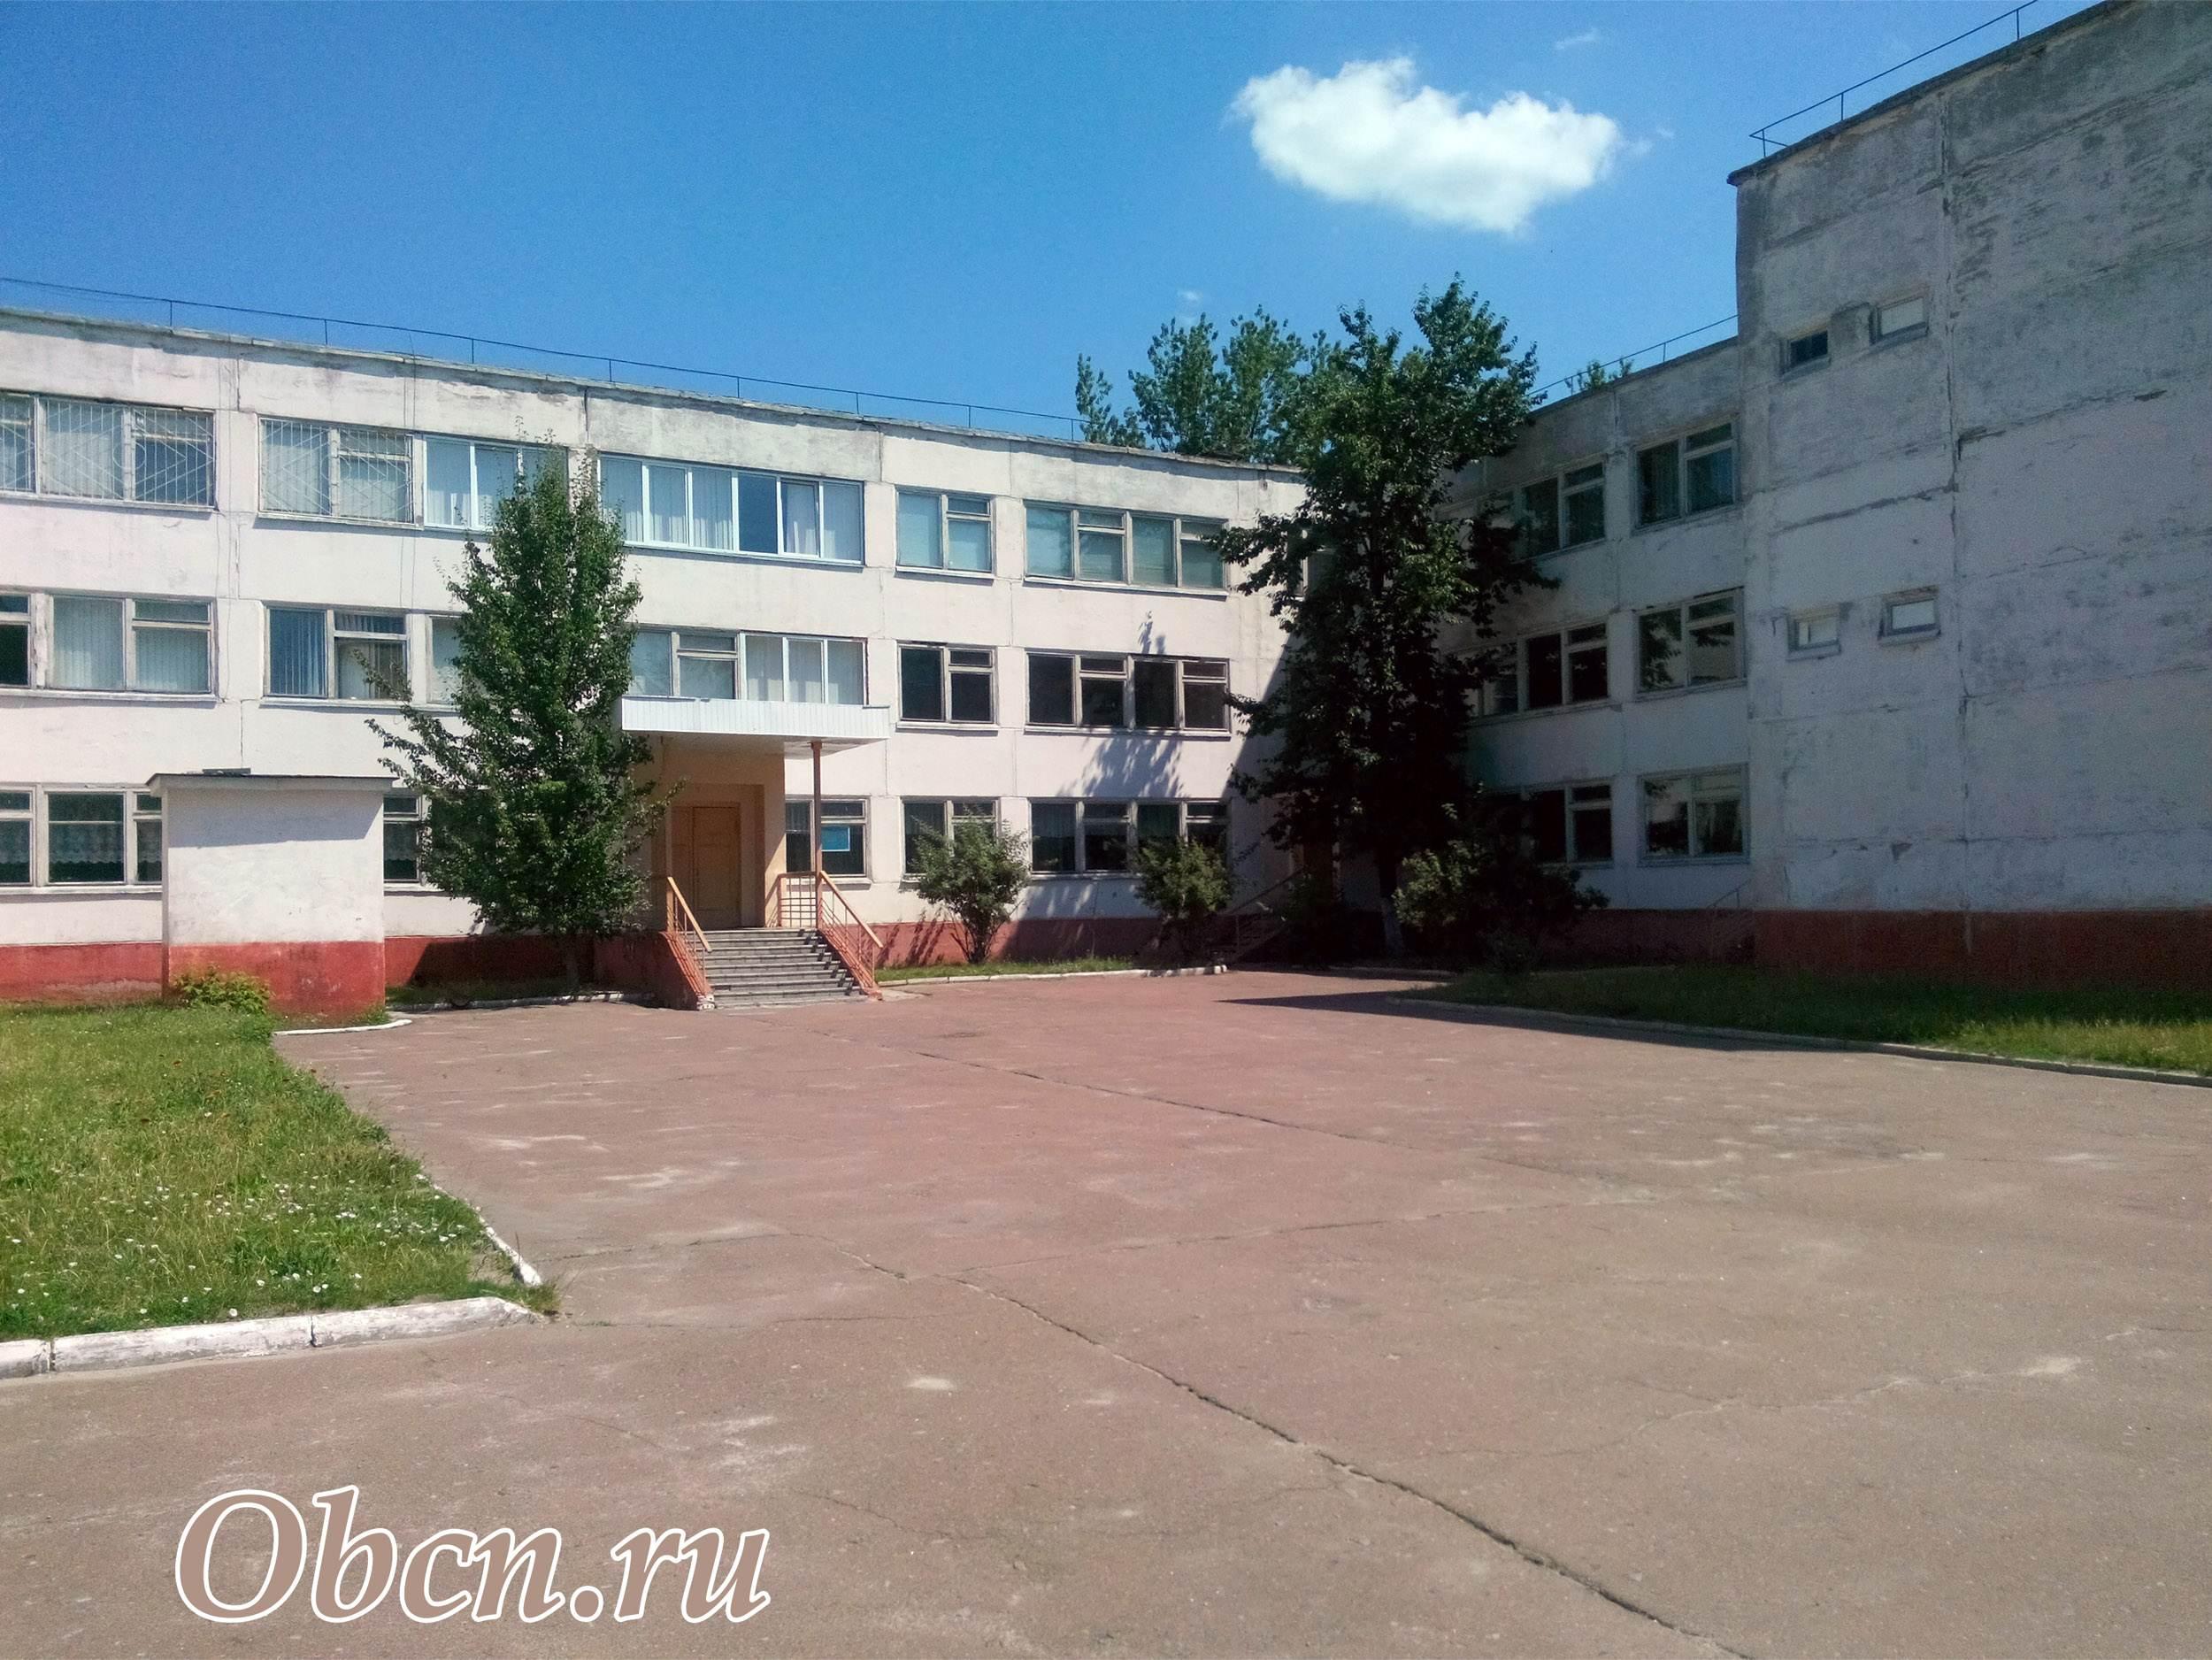 начальная 25-ая школа Чернигова